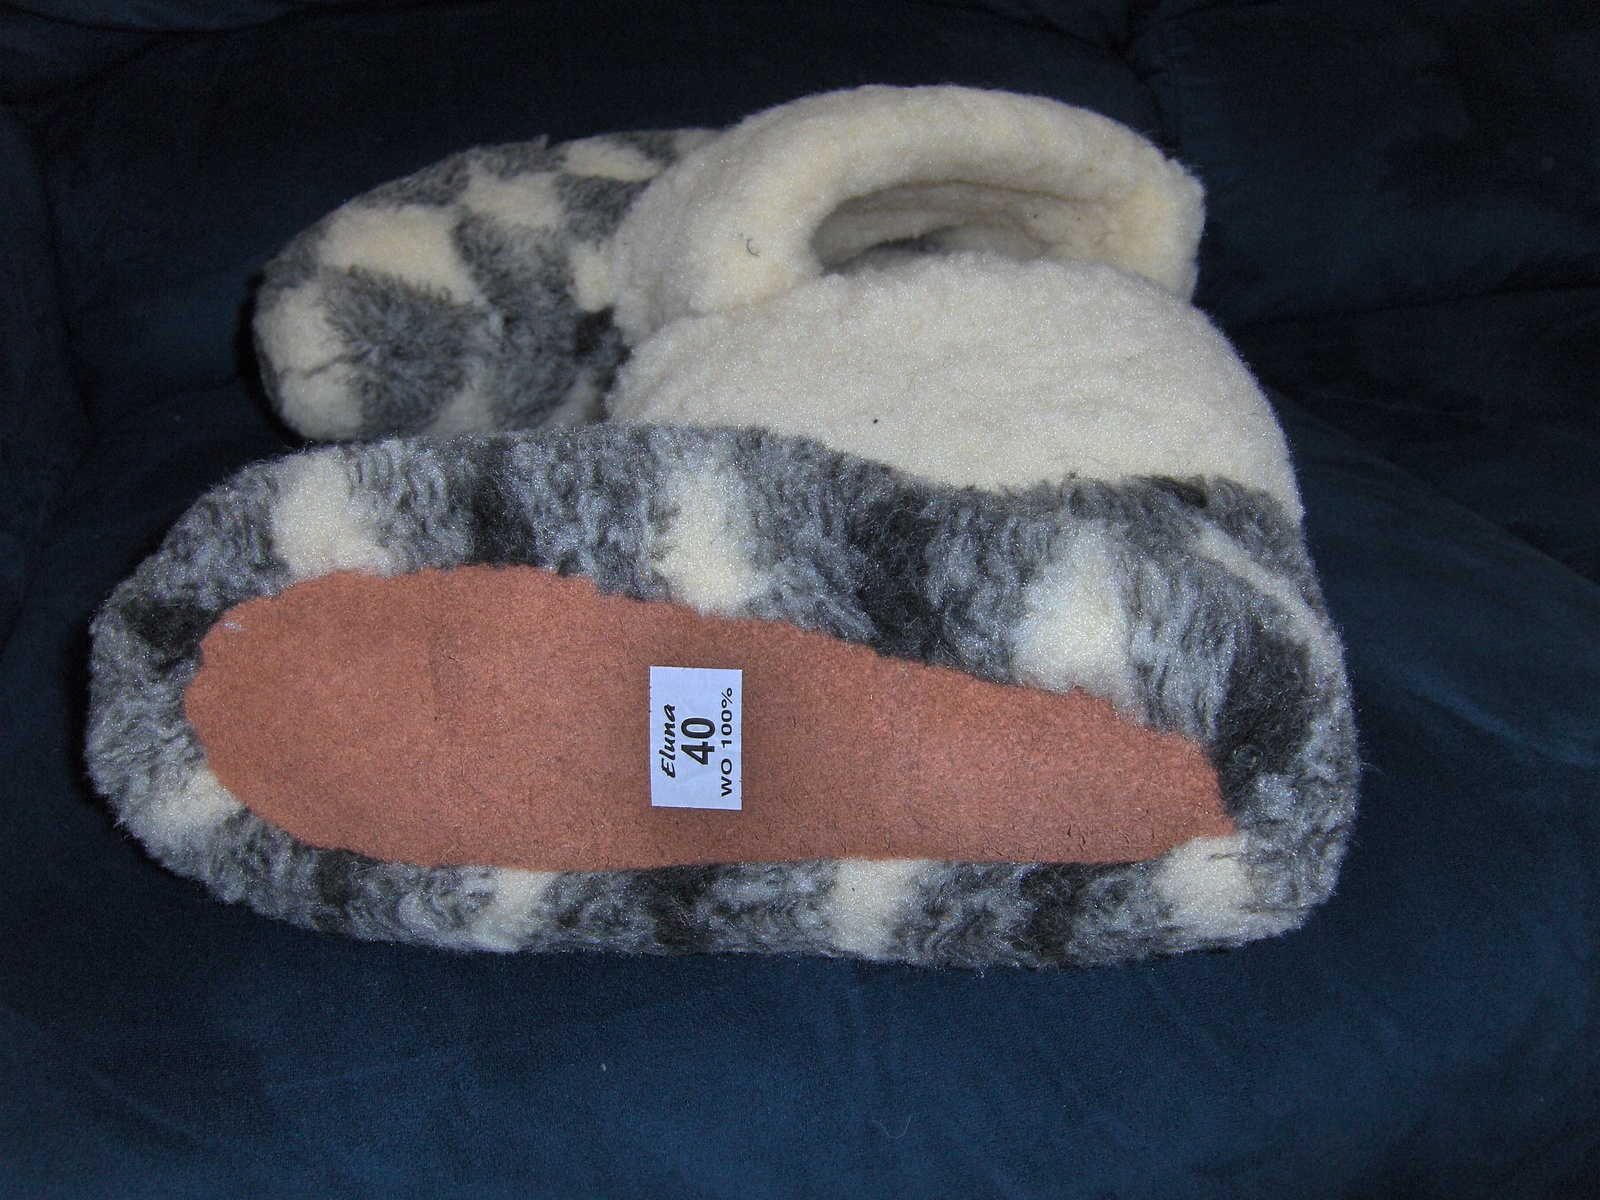 Eluna 100% Sheepskin Slippers Size 40 Unisex Handmade